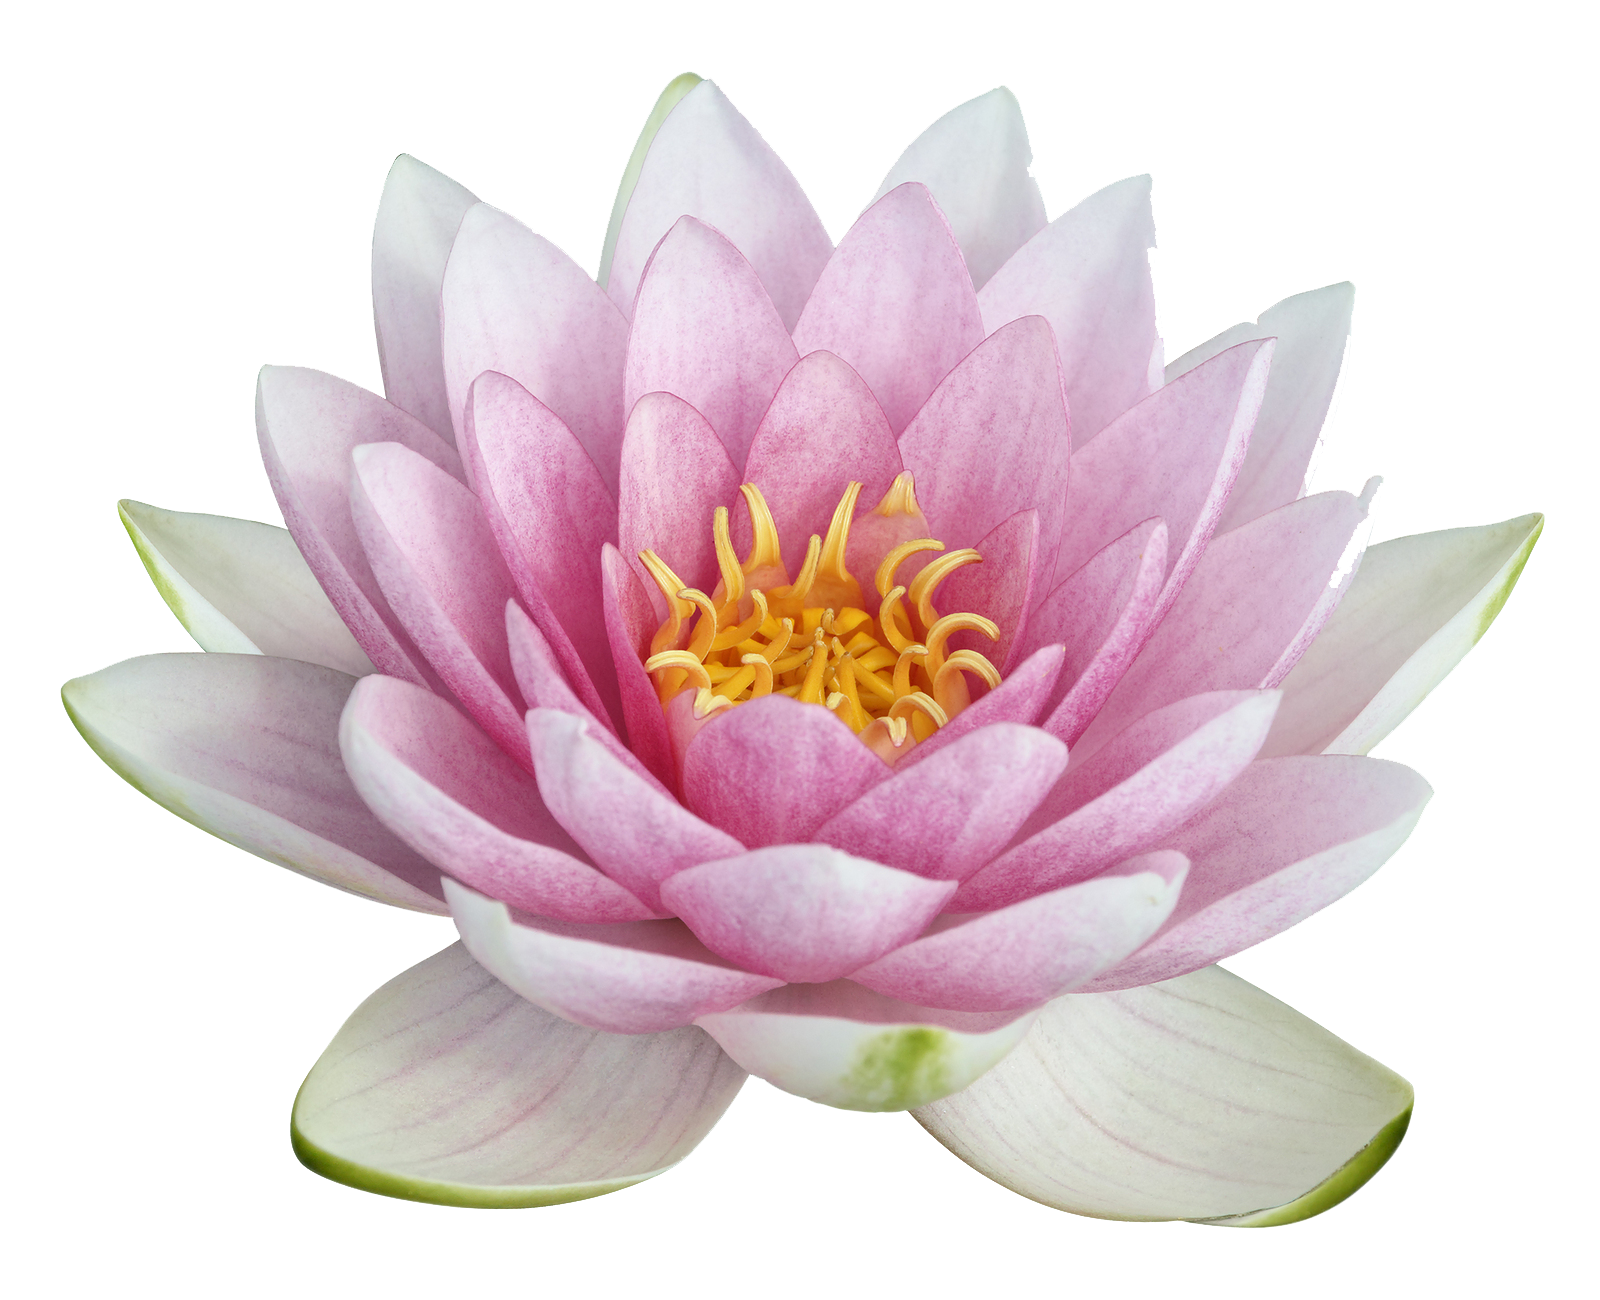 Download Lotus Image Hq Png Image Freepngimg